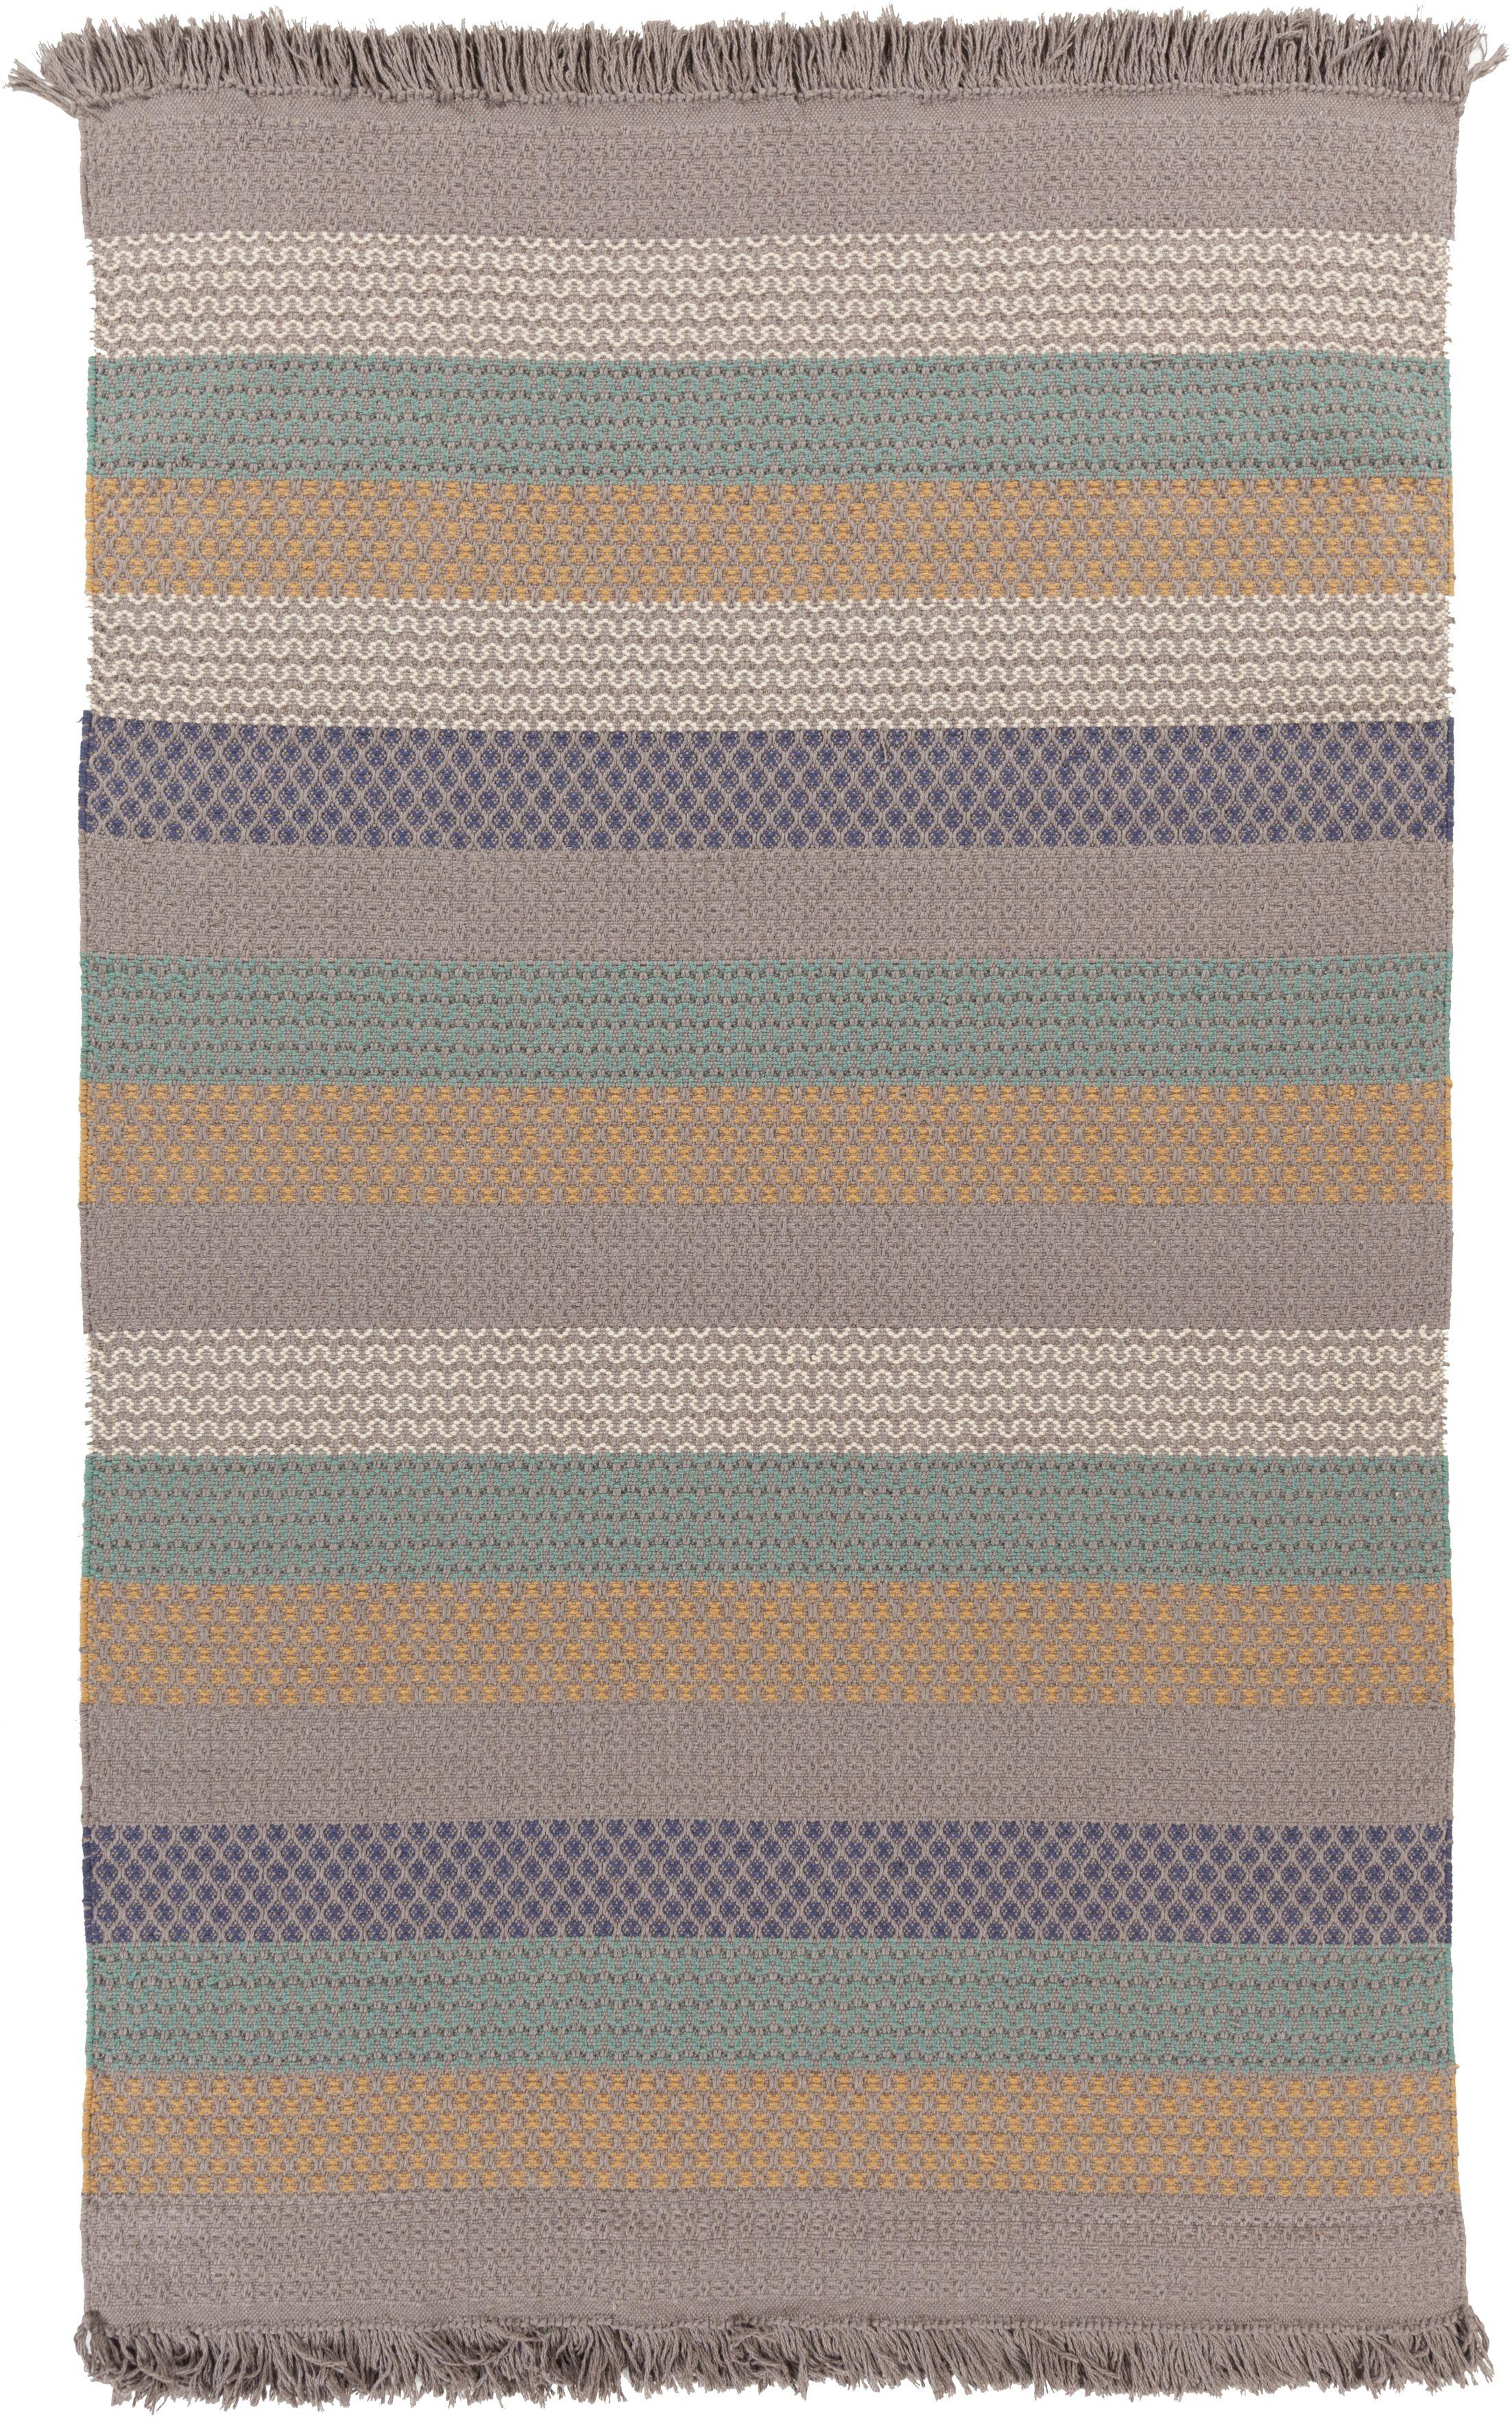 Ayana Hand-Woven Stripe Area Rug Rug Size: Rectangle 5' x 8'